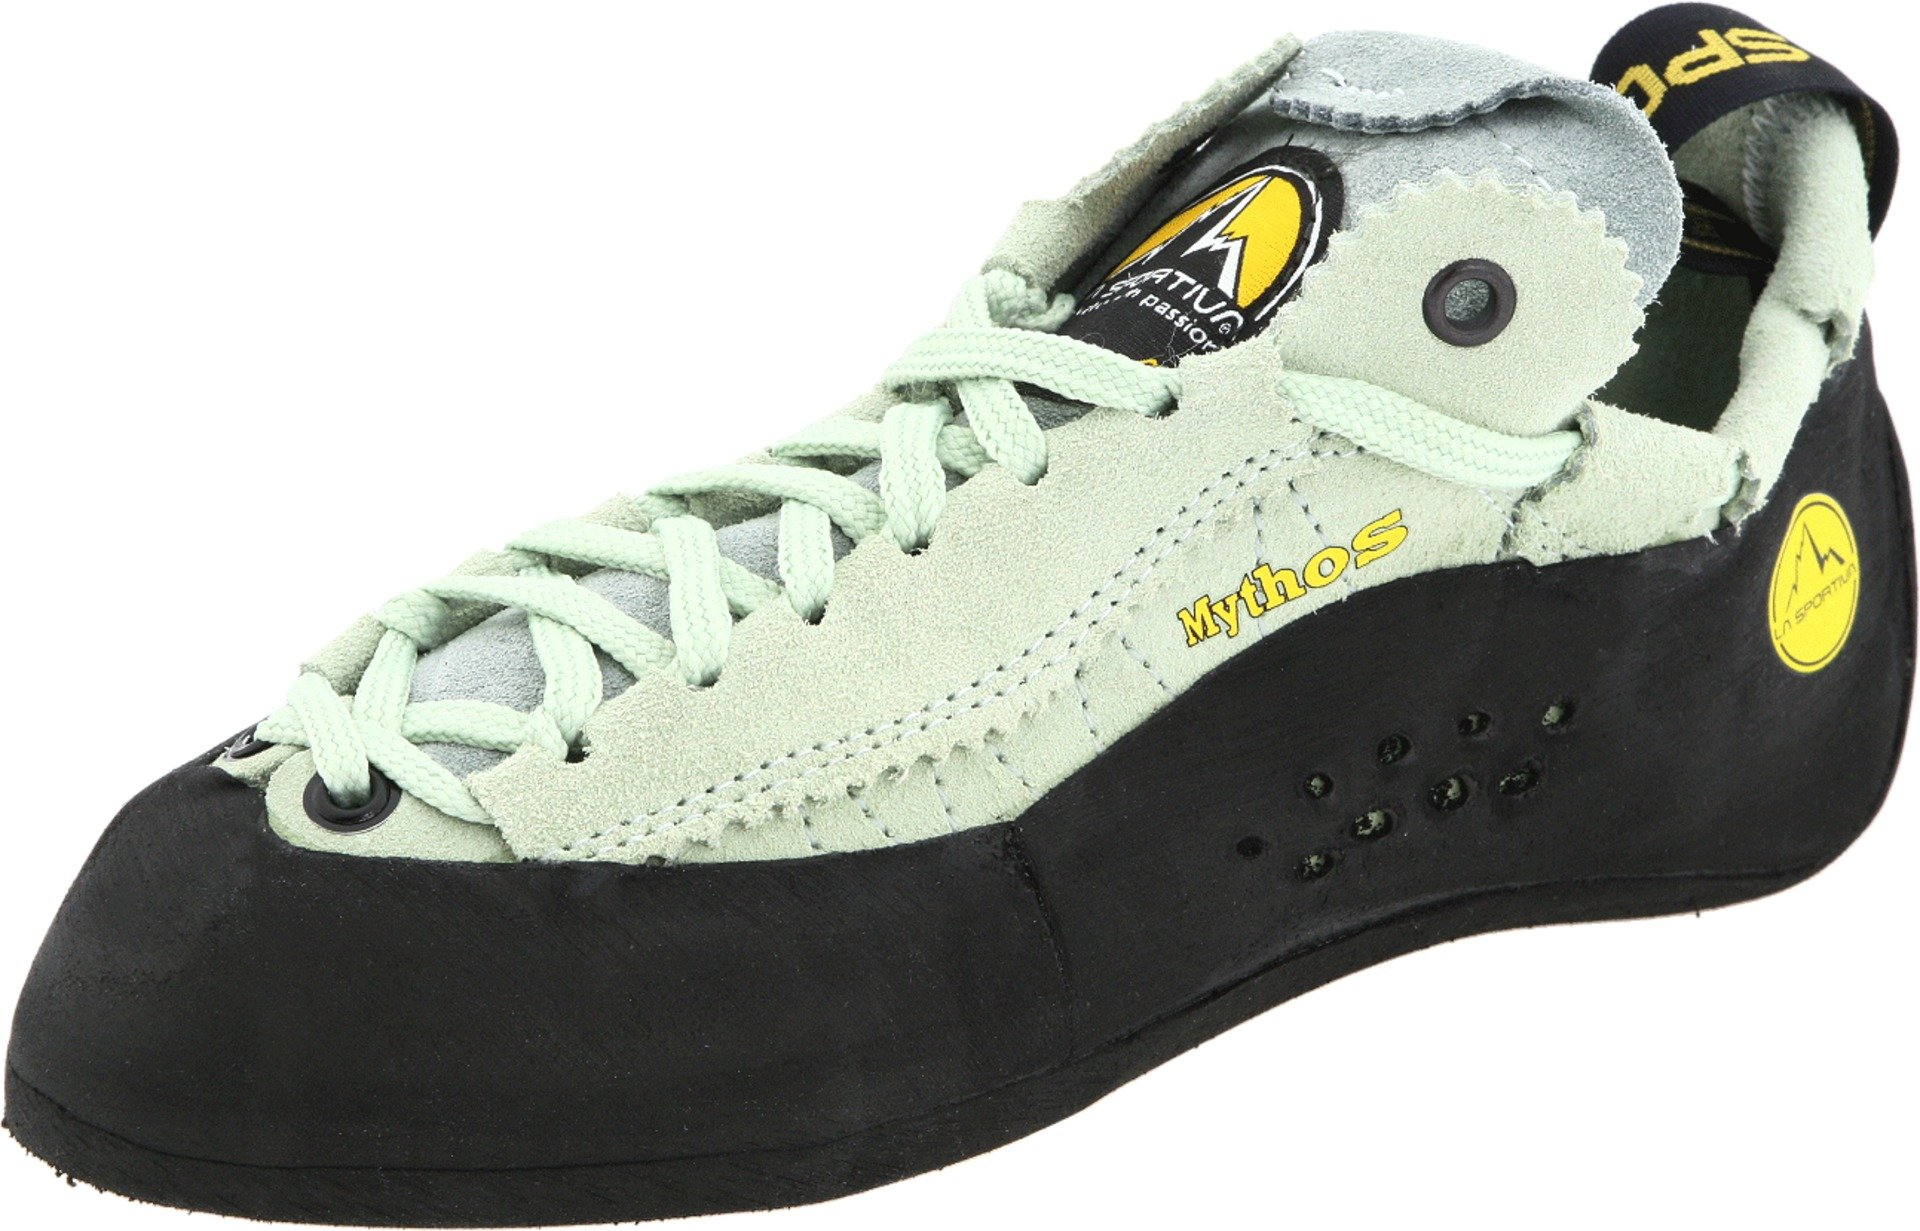 La Sportiva Mythos Lace-Up Climbing Shoe - Women's, Pistachio, 41.5 M EU by La Sportiva